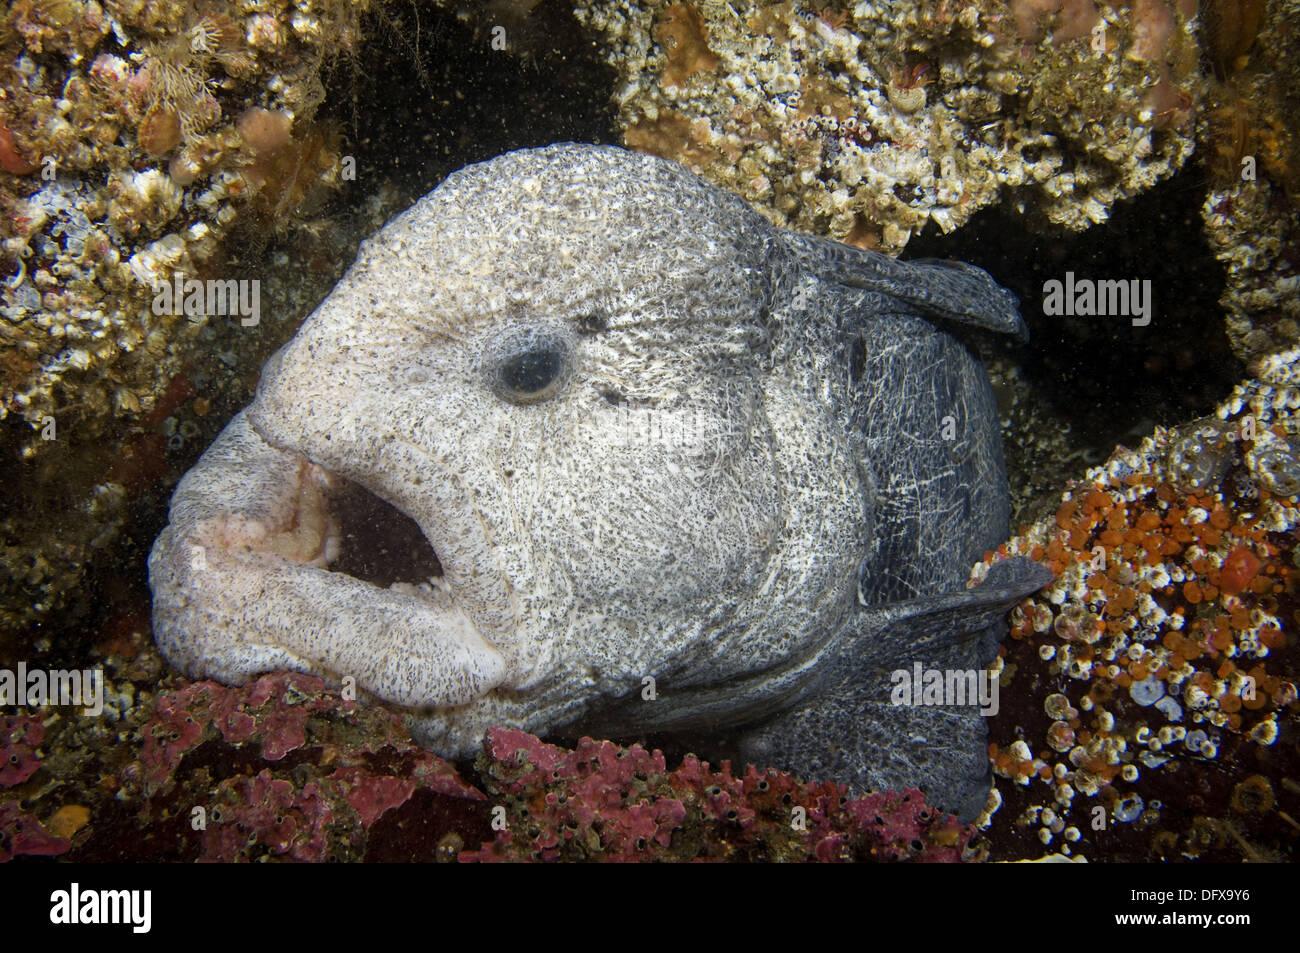 Wolf eel pacific northwest fish stock photo royalty for Pacific northwest fish